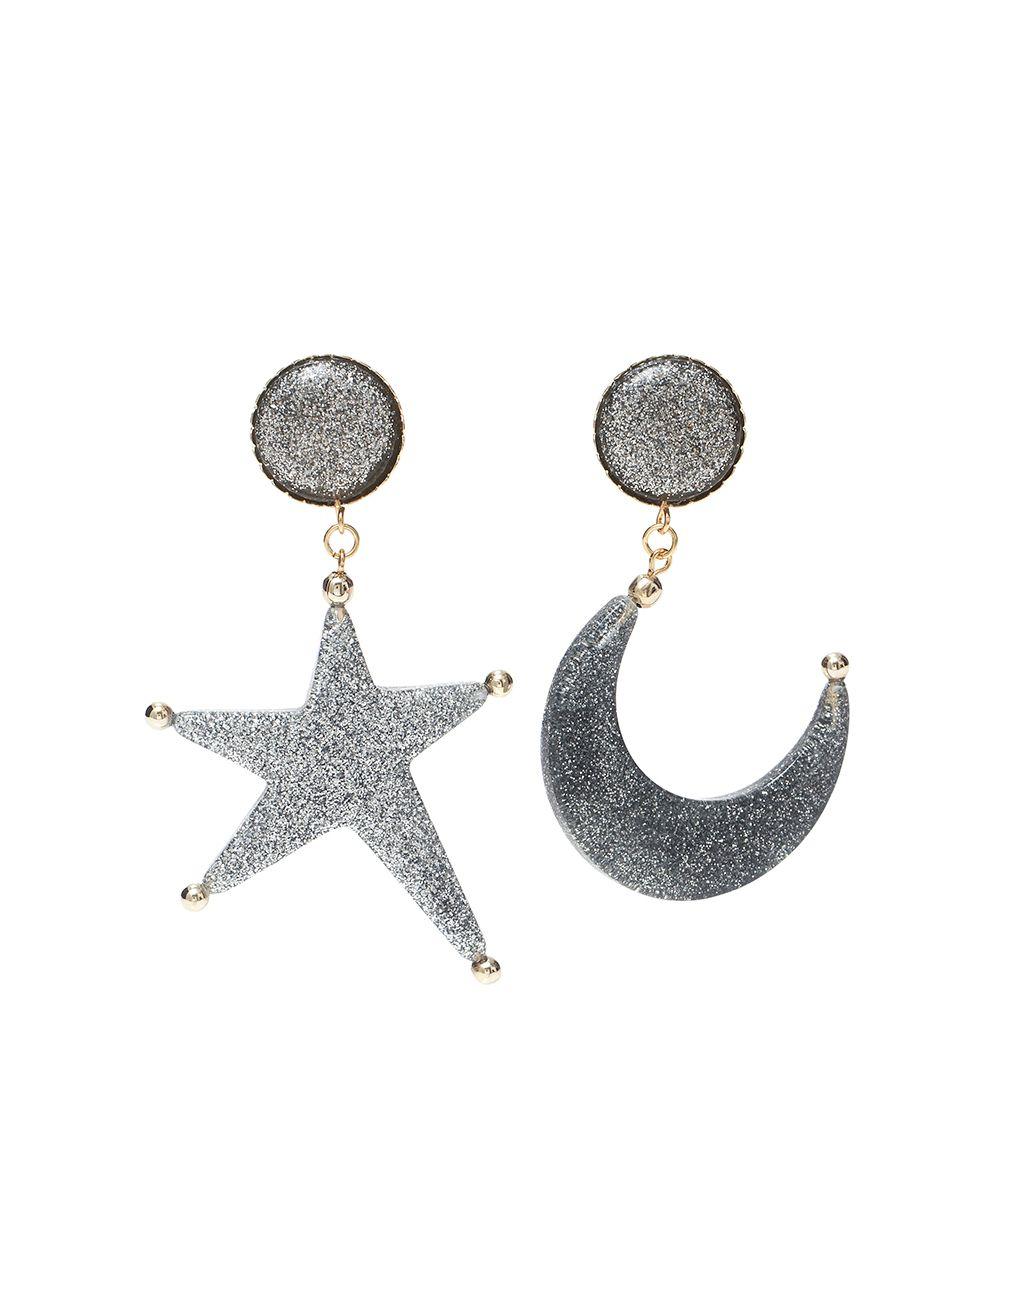 Brinco Lua Estrela Glitter Etoiles